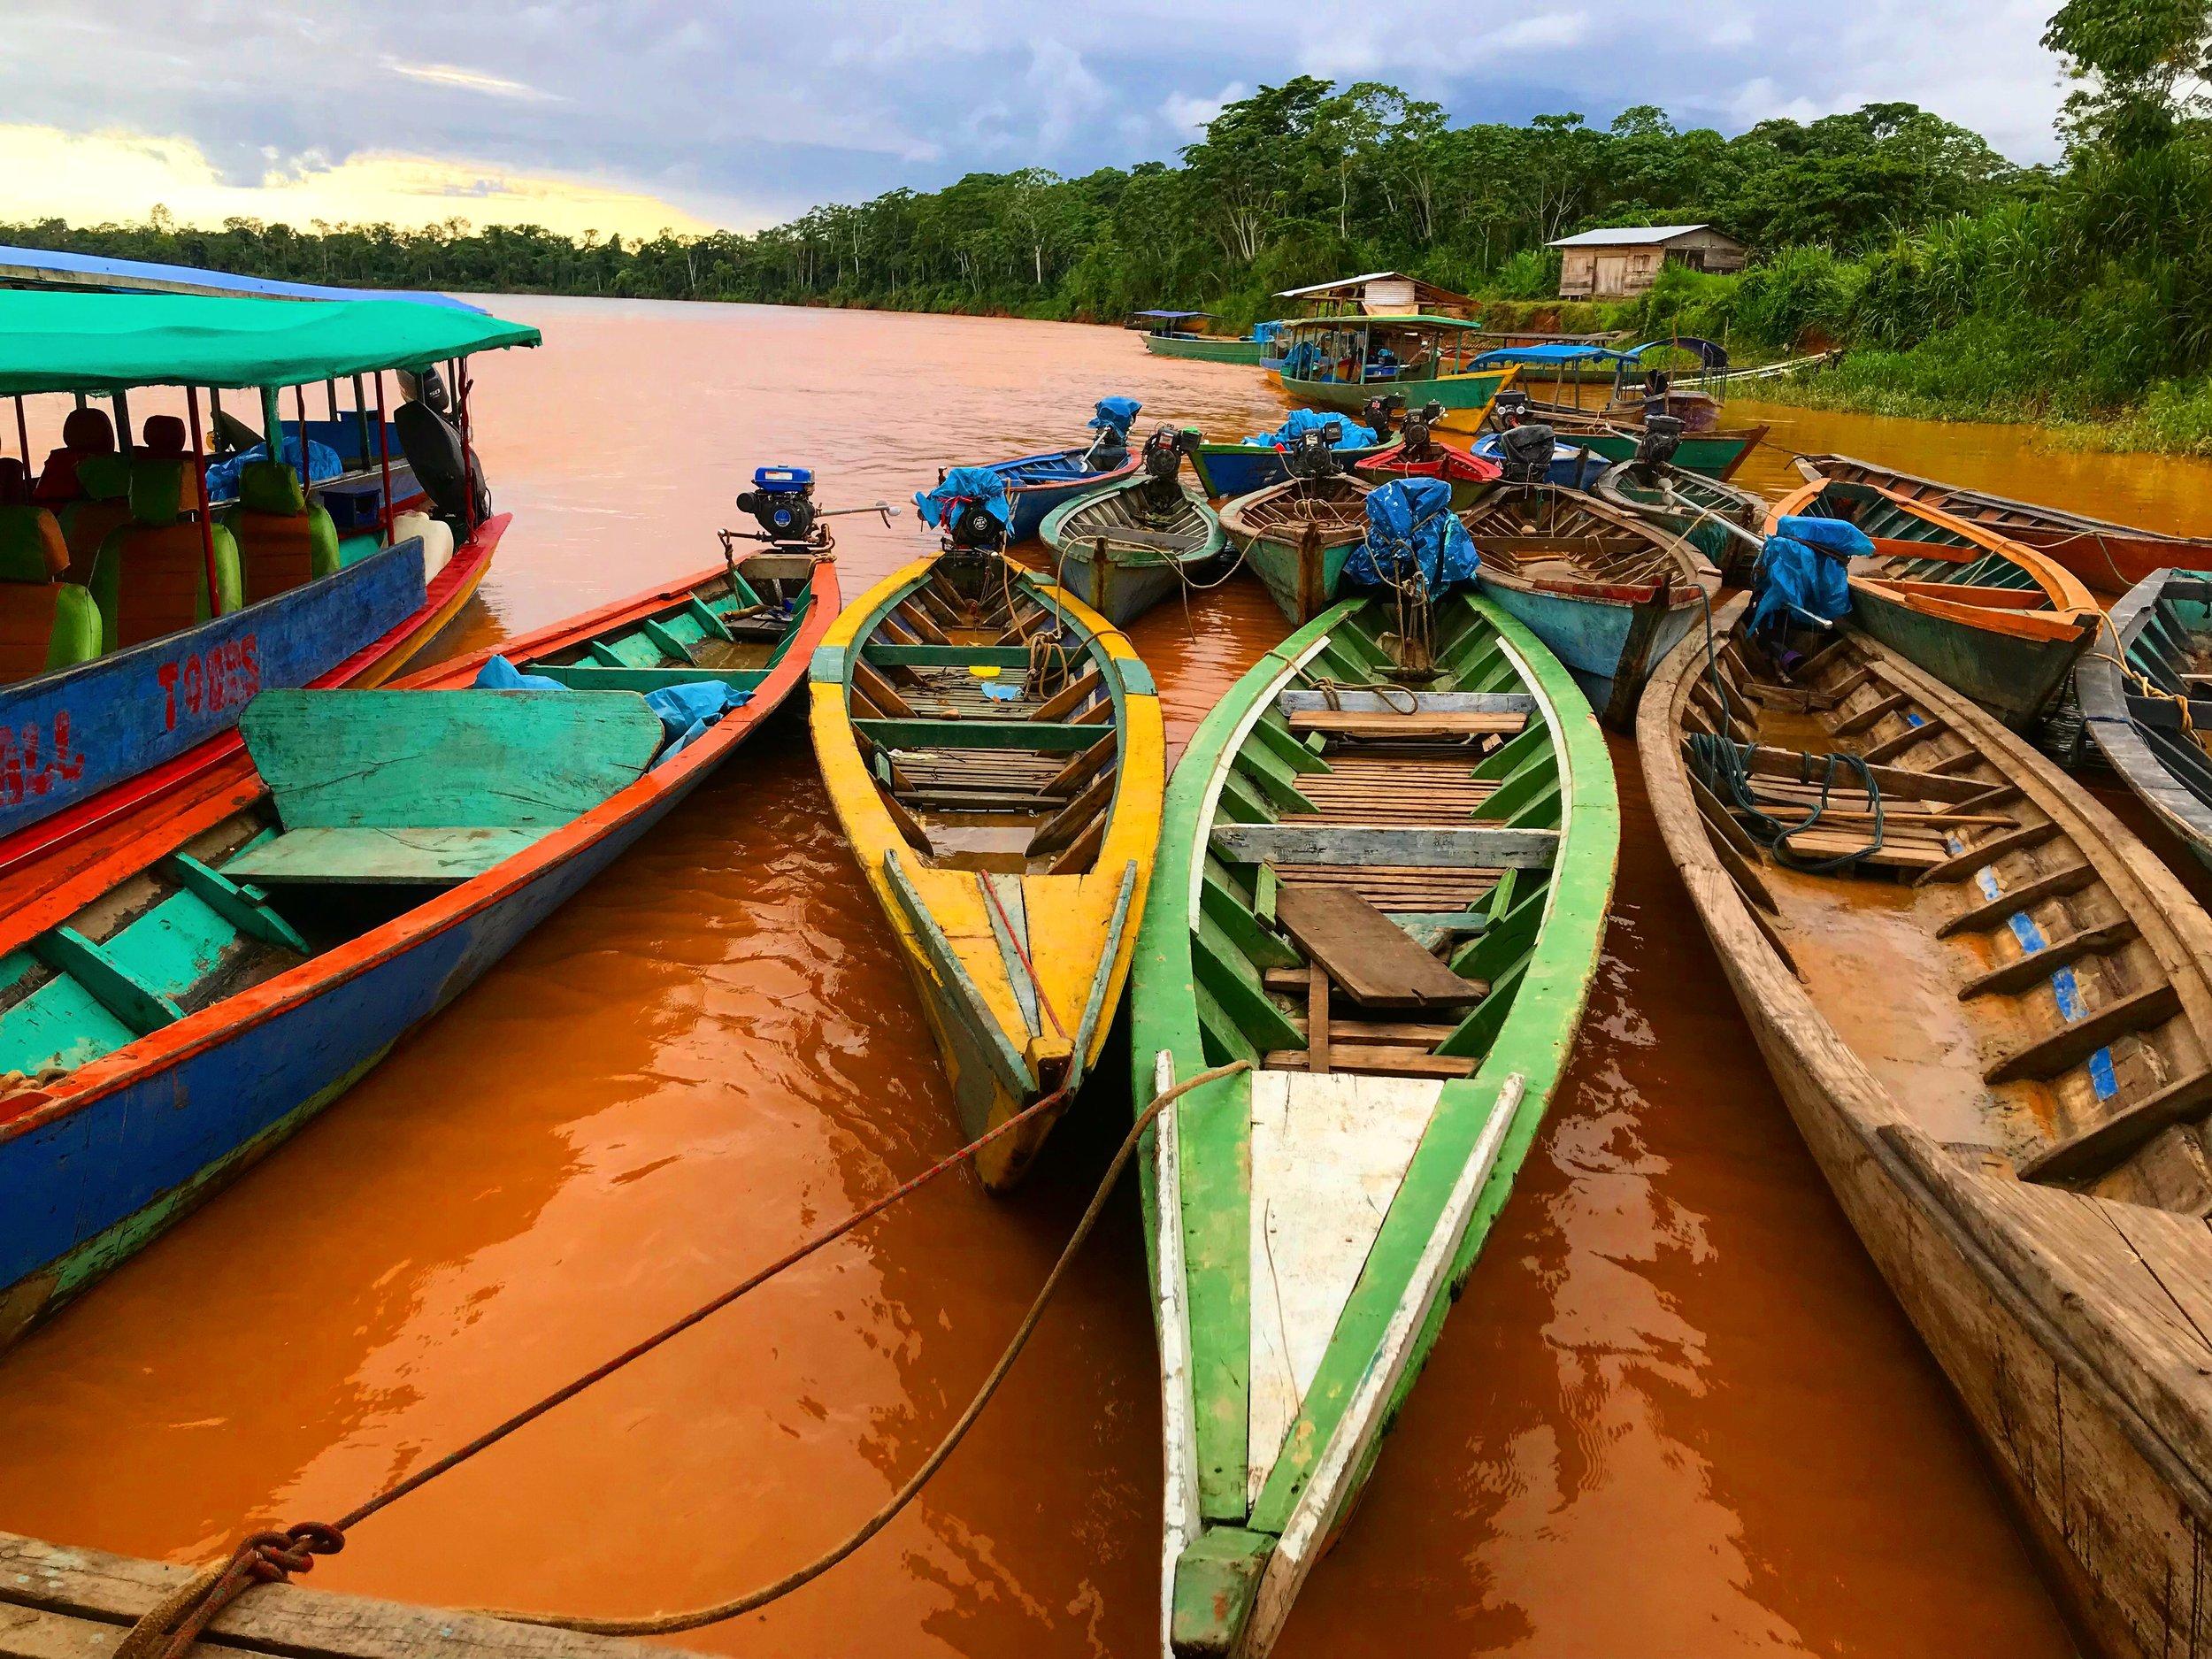 6. Peke-peke boats